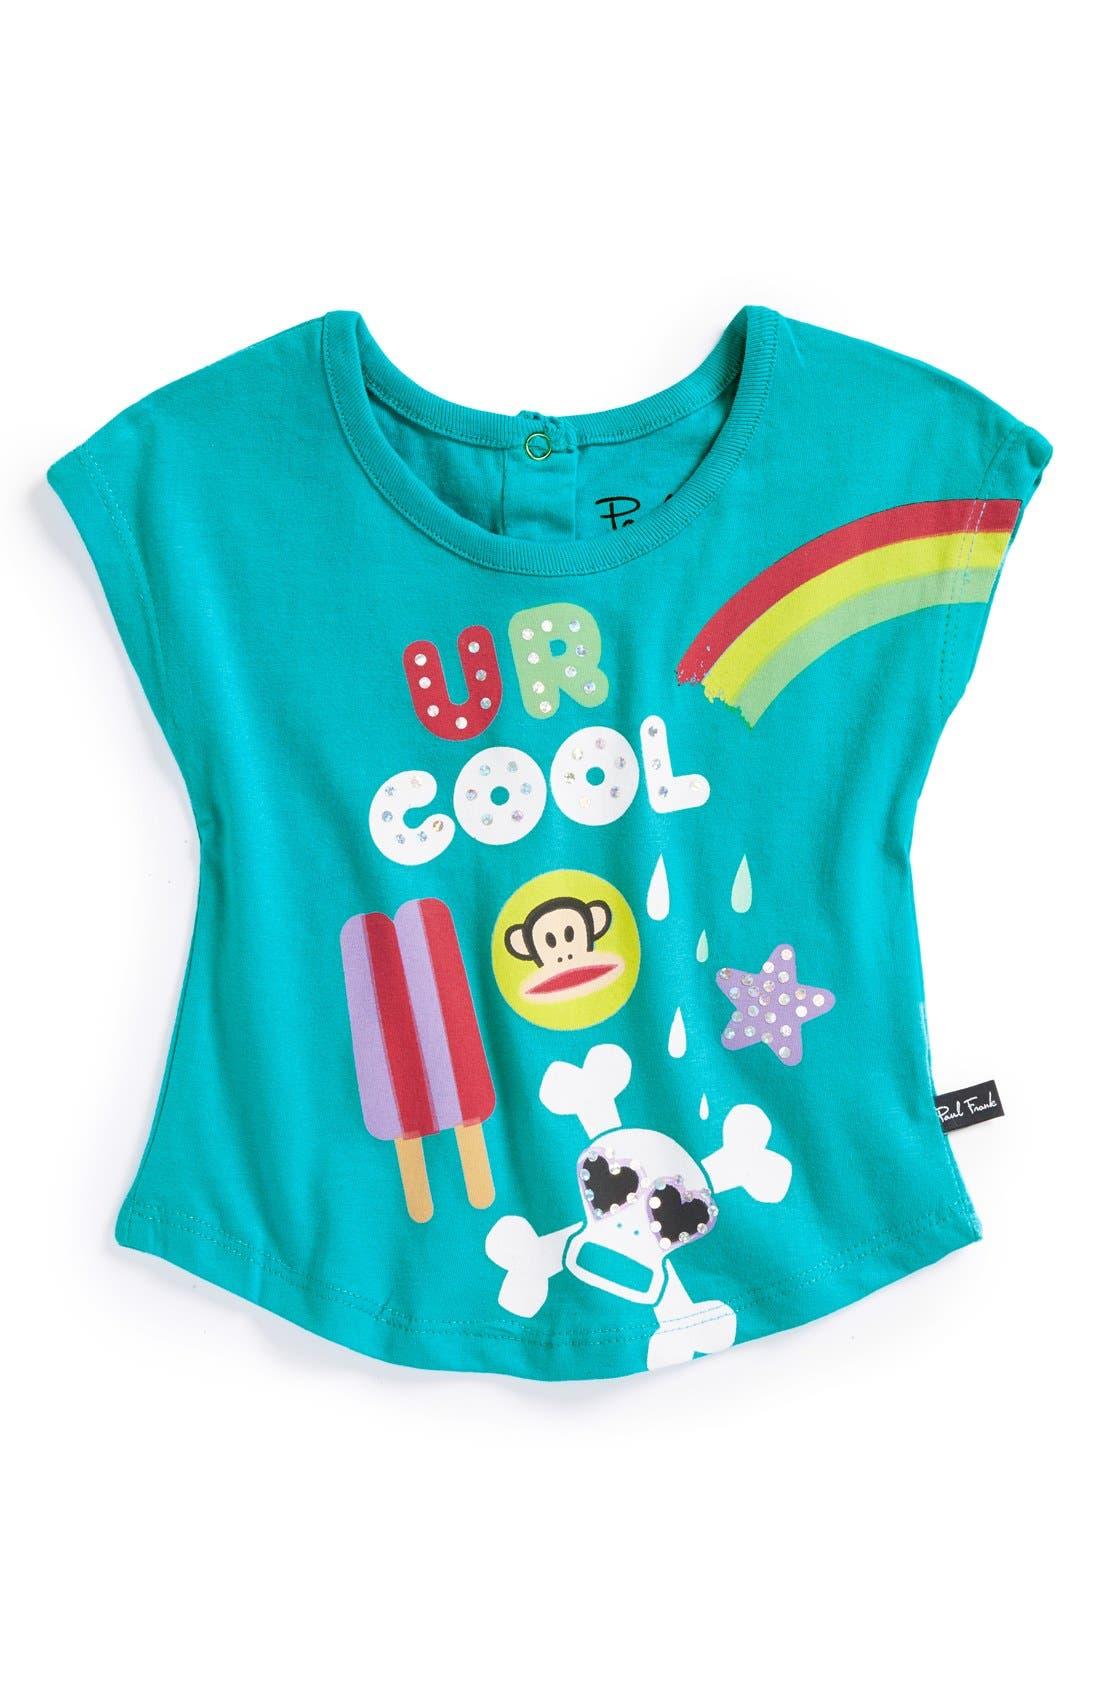 Alternate Image 1 Selected - Paul Frank 'U R Cool' Graphic Tee (Baby Girls)